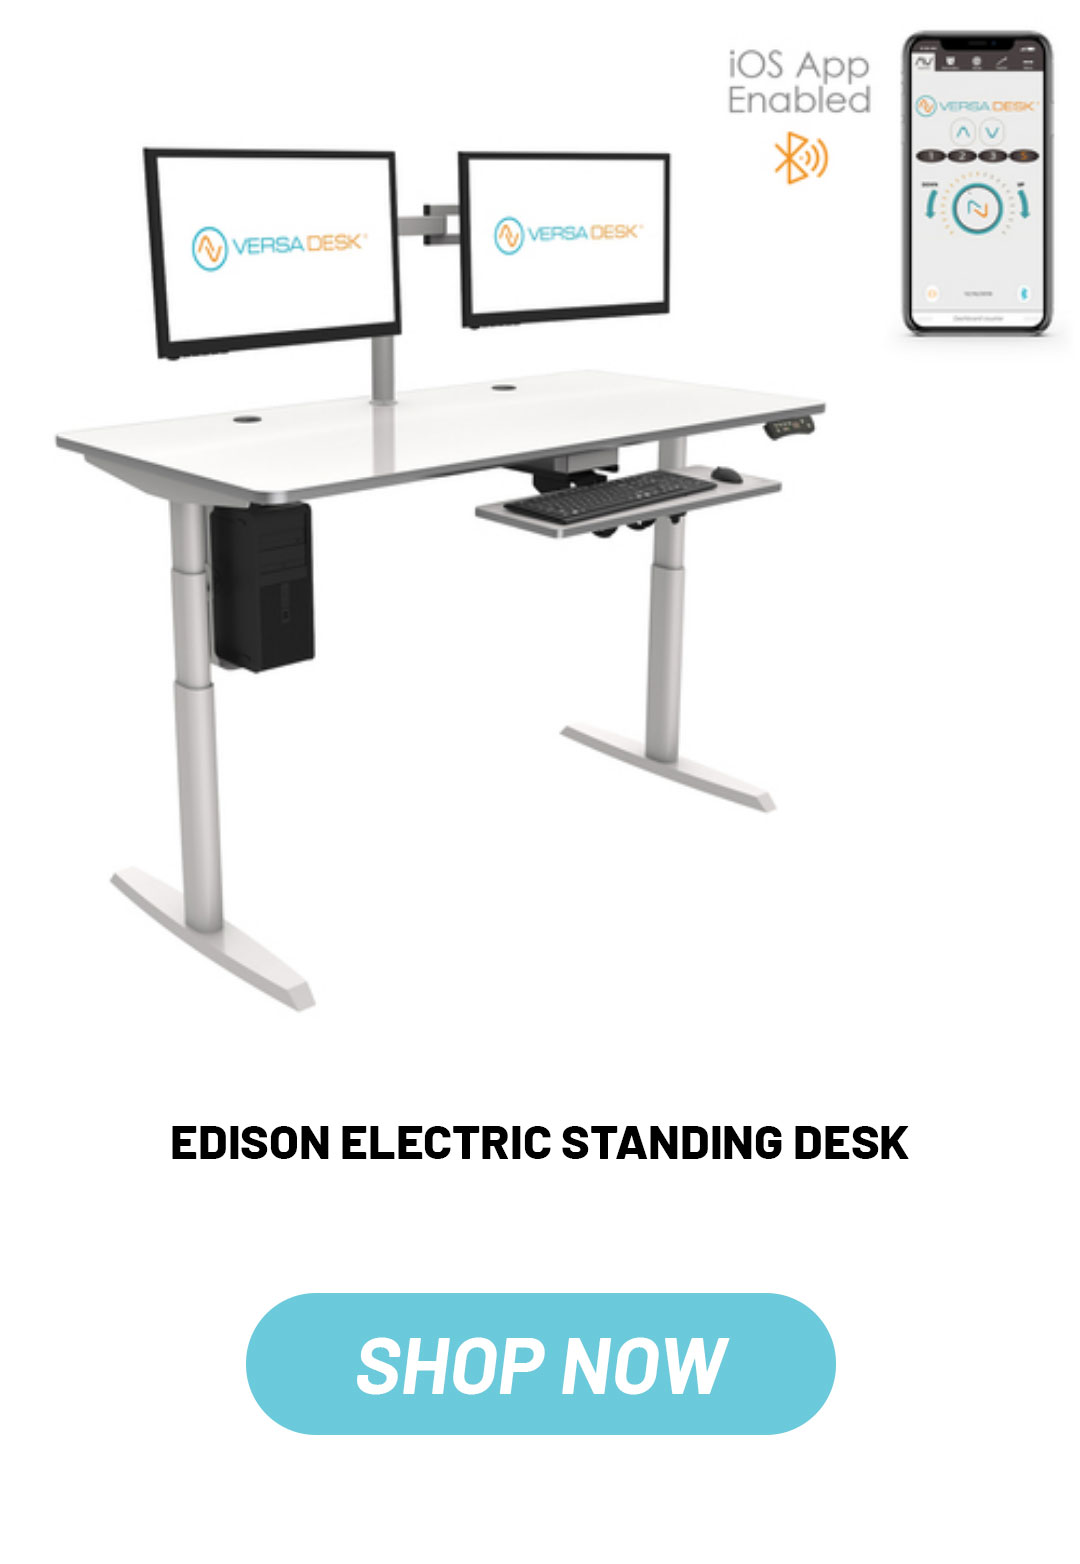 VersaDesk Edison electric standing desk